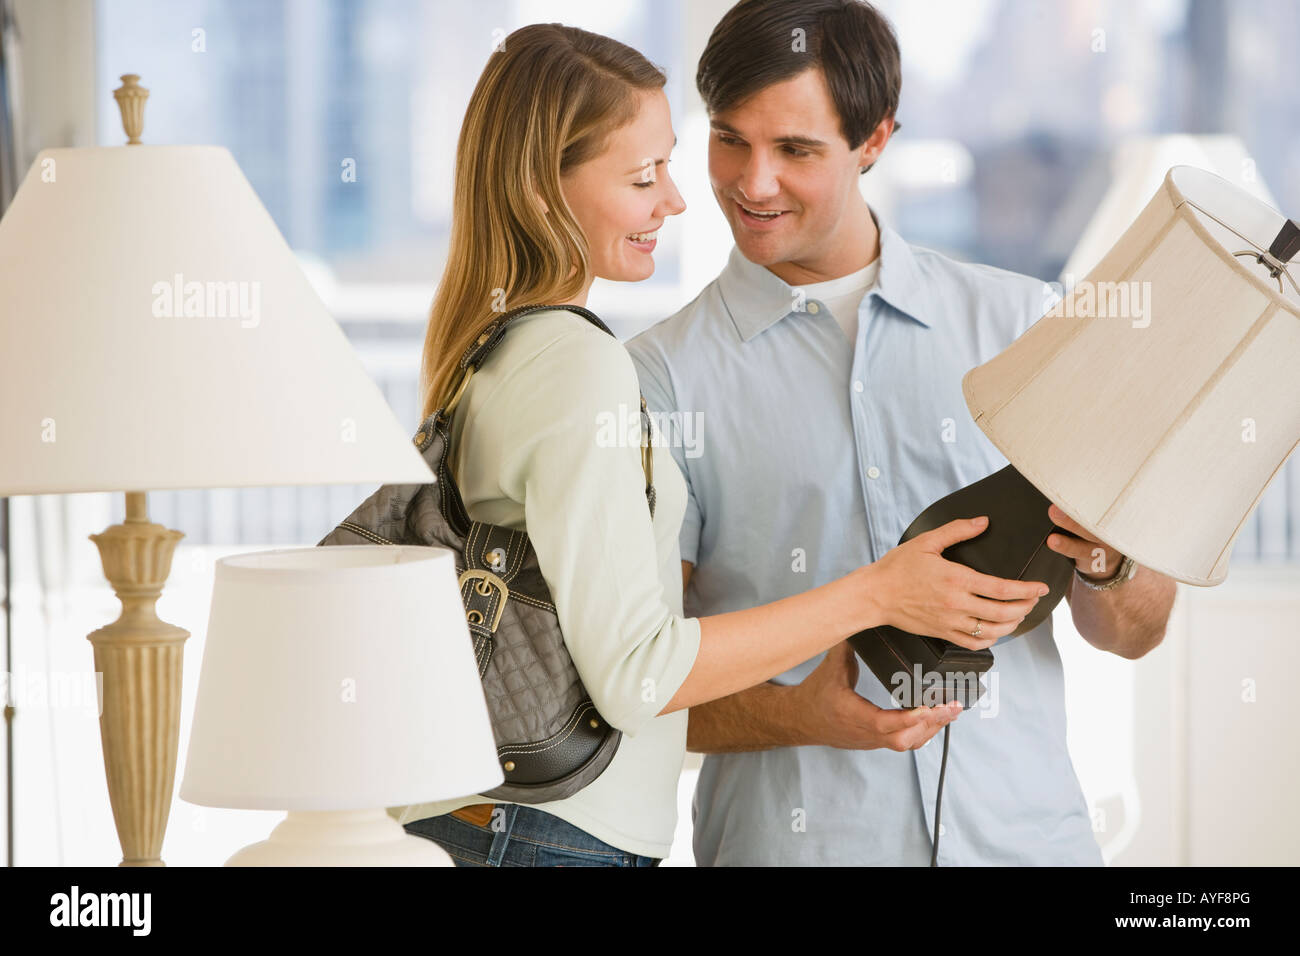 Couple shopping for lighting - Stock Image